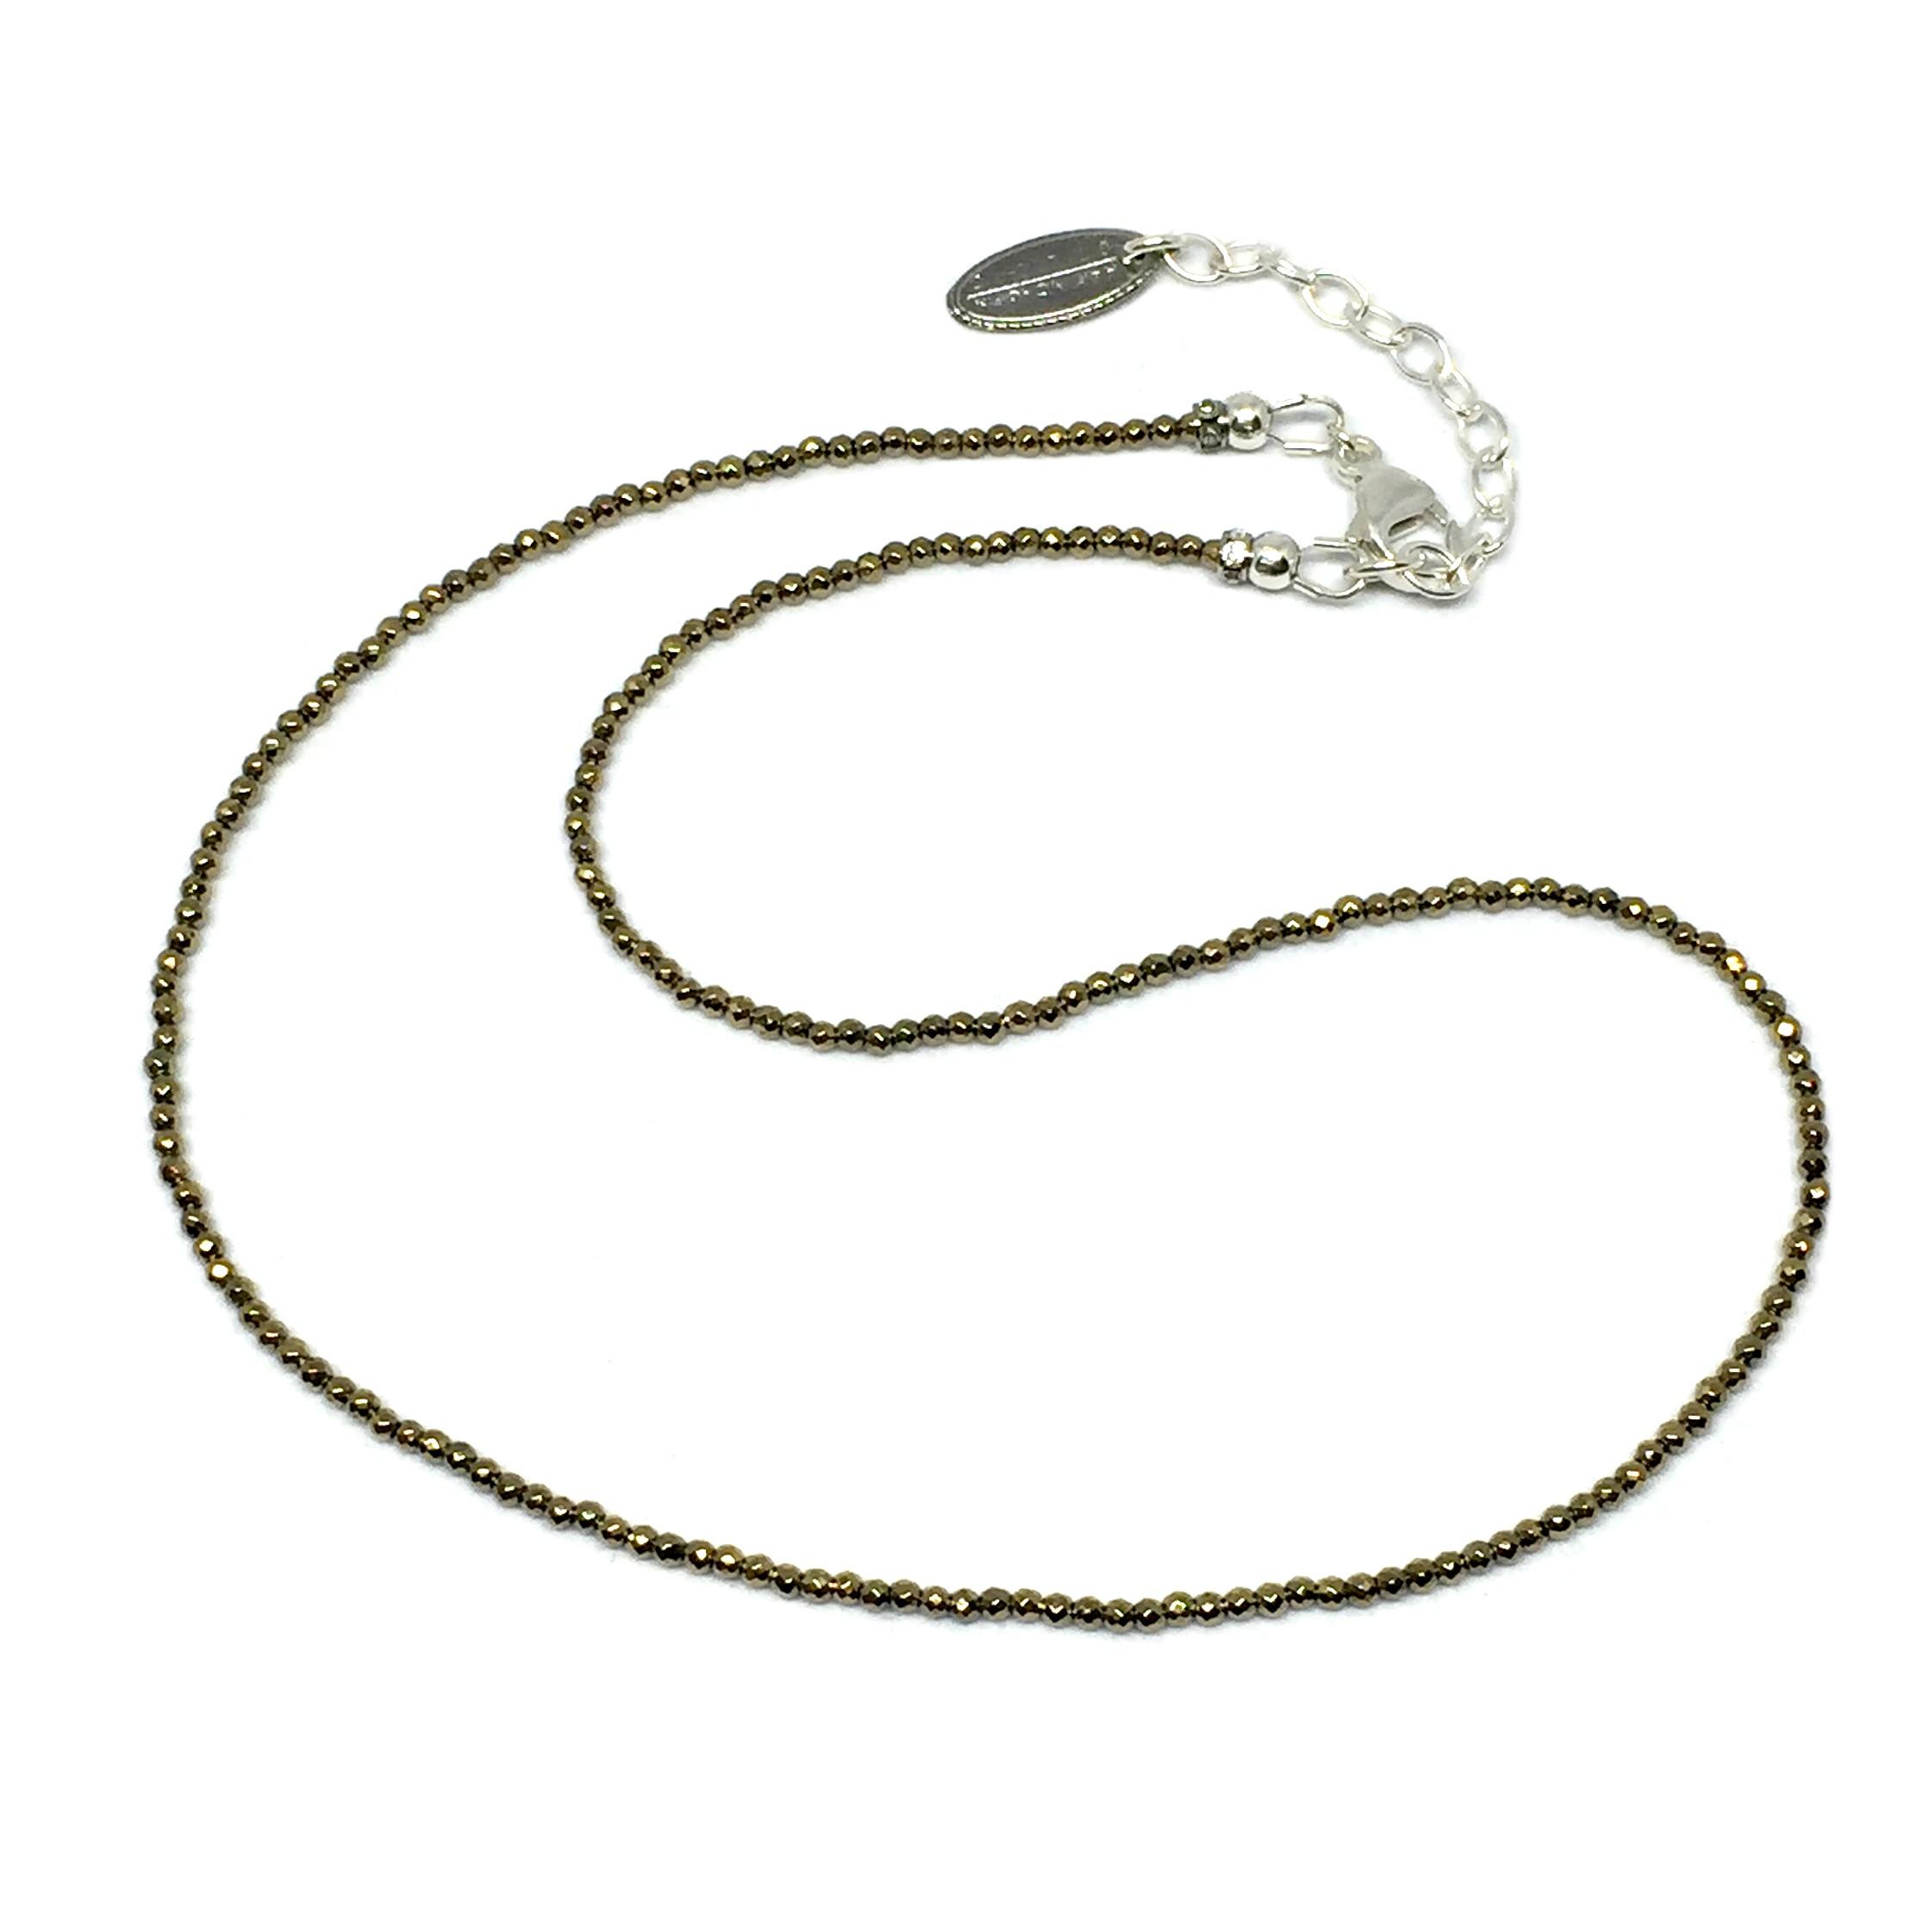 Gold hematite sparkle necklace by Karyn Chopik | Effusion Art Gallery + Cast Glass Studio, Invermere BC